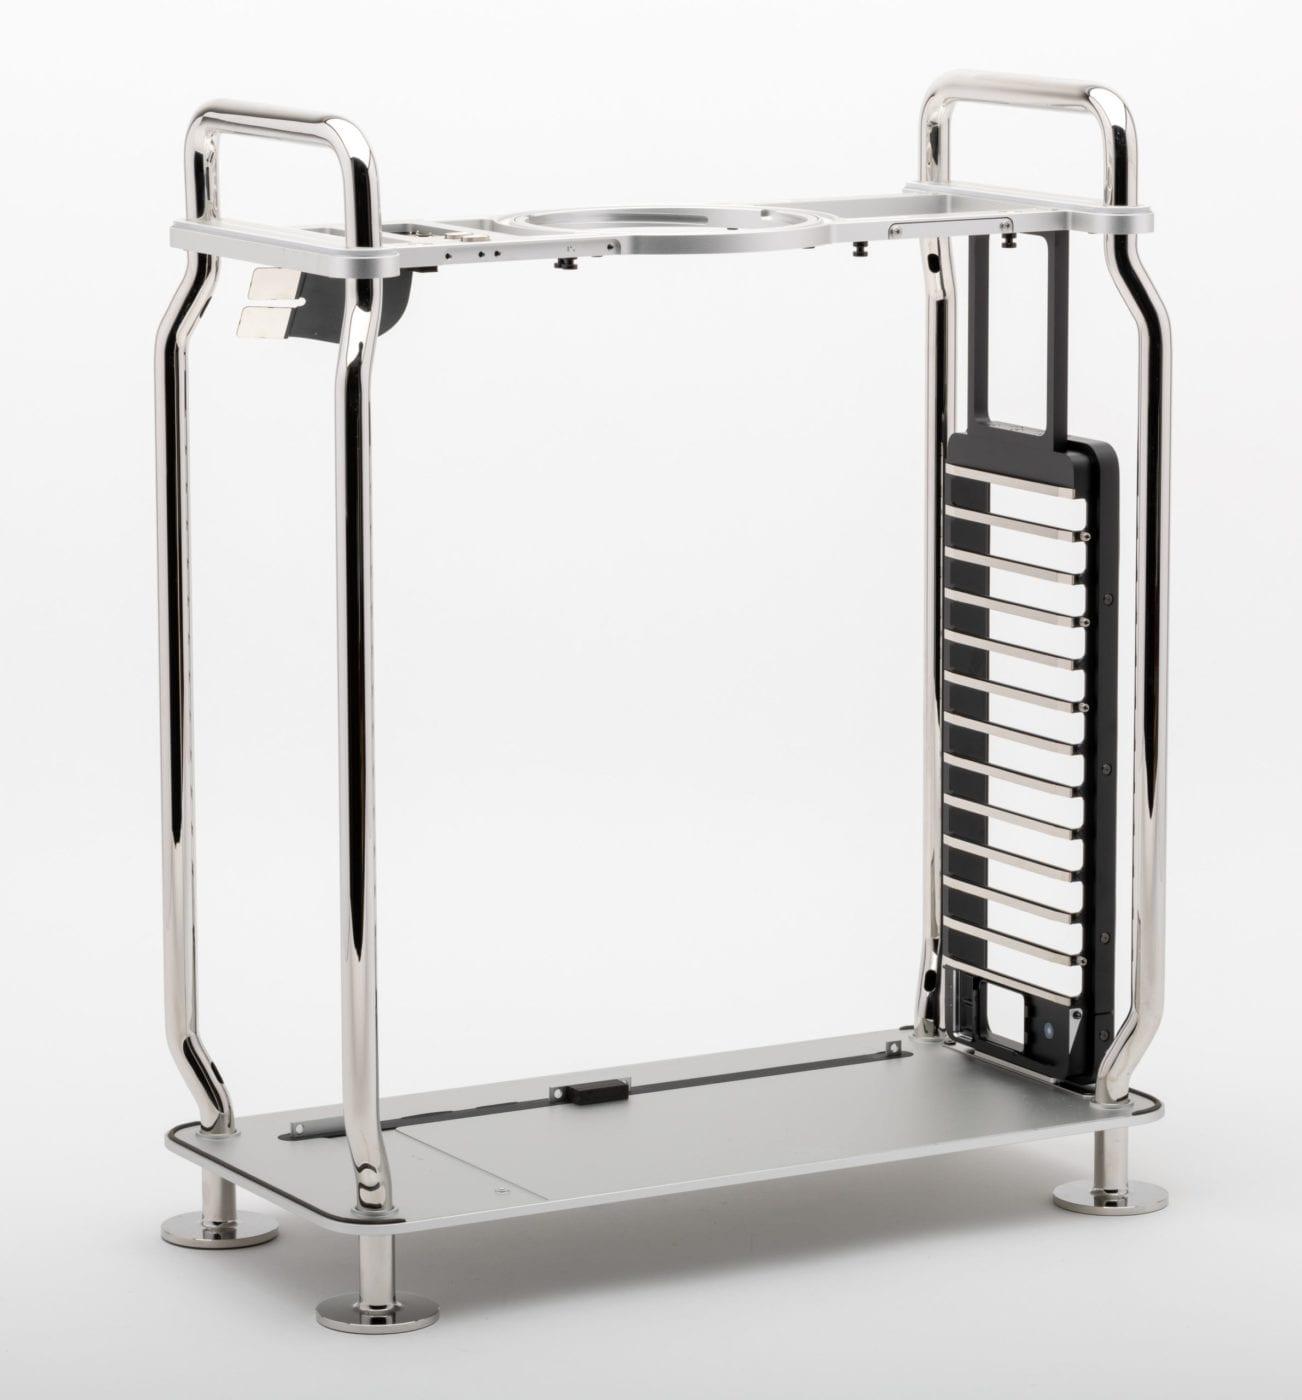 2019 Mac Pro – Empty frame